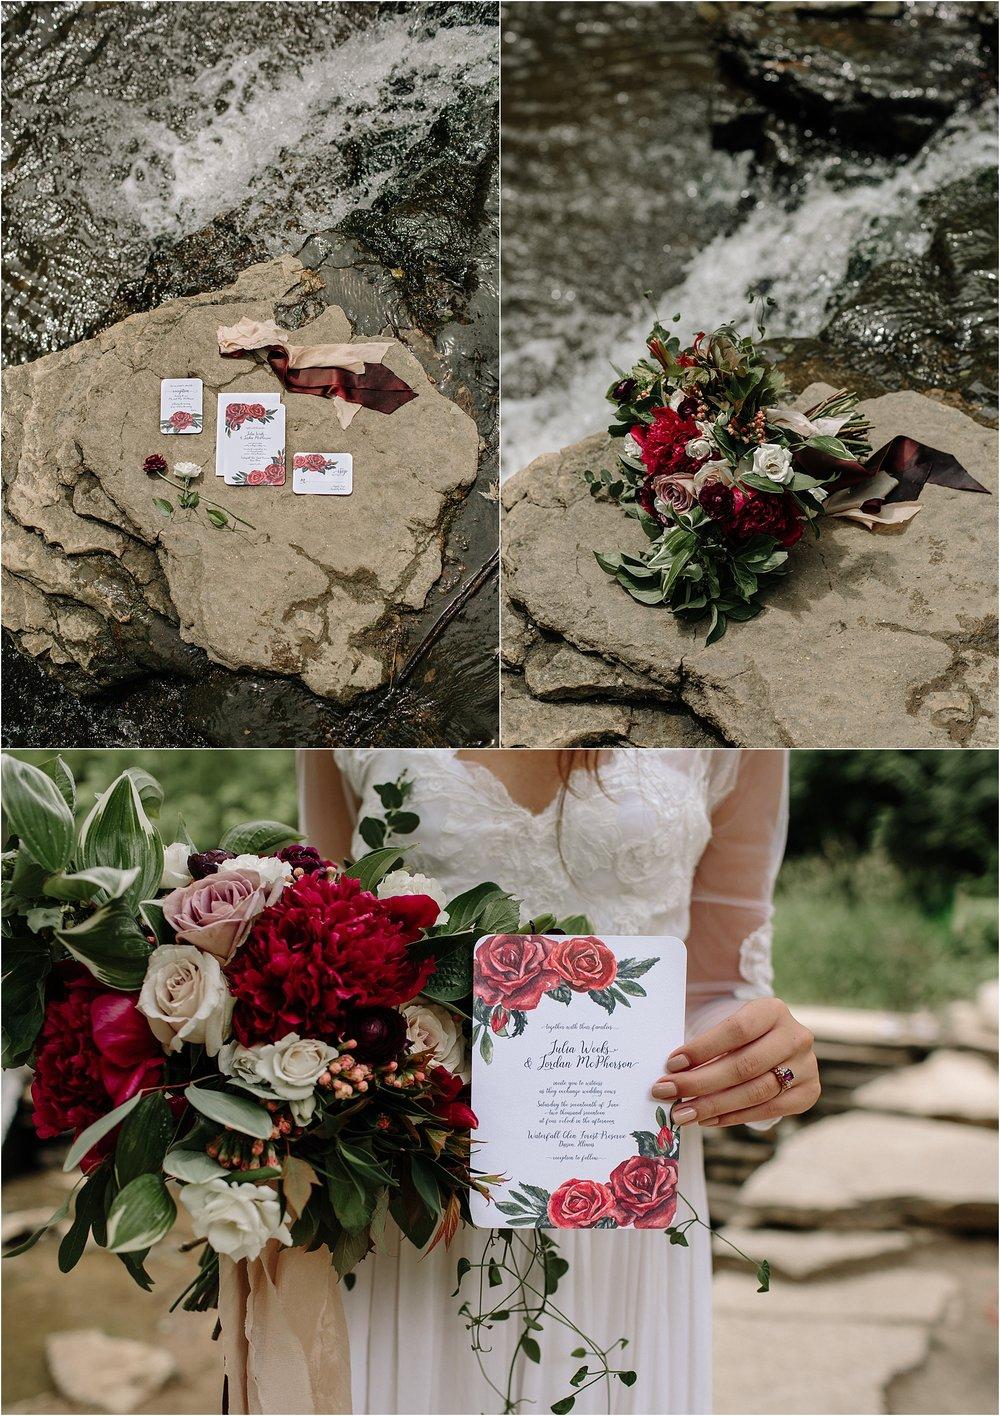 waterfall-glen-wedding-lemont-il-1-3.jpg